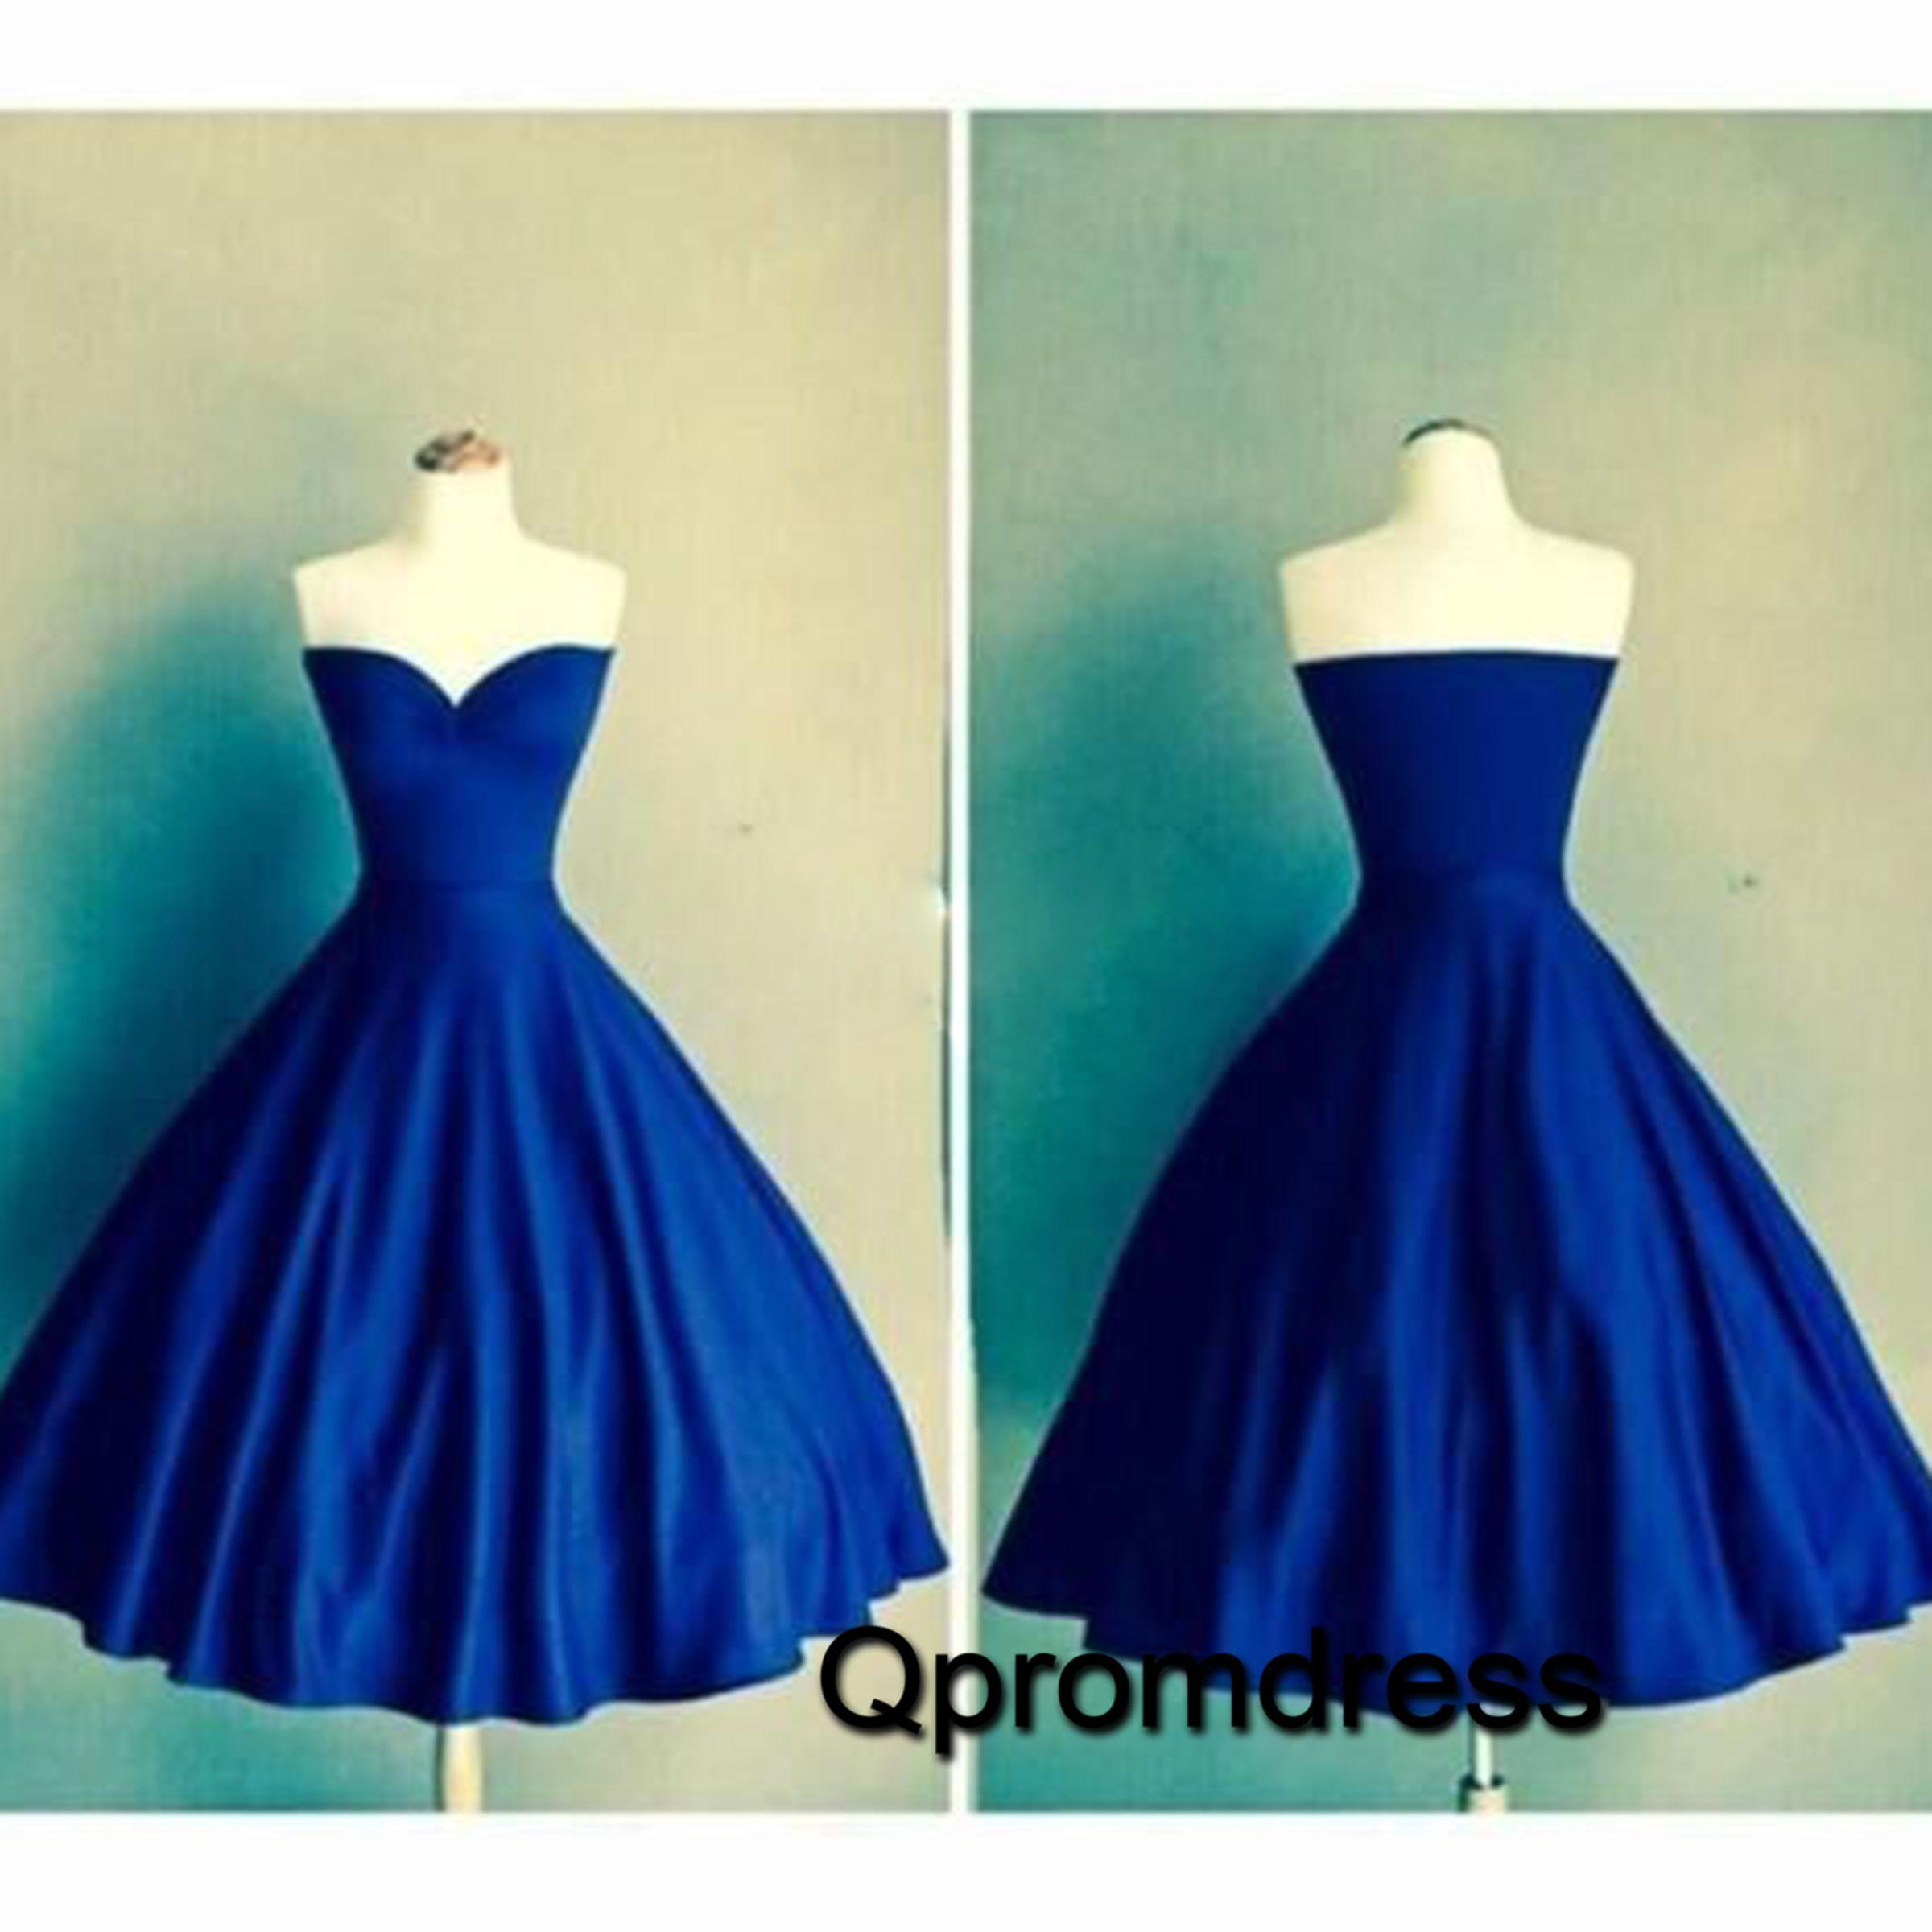 Cute navy blue satin sweetheart dress for prom bridal dress